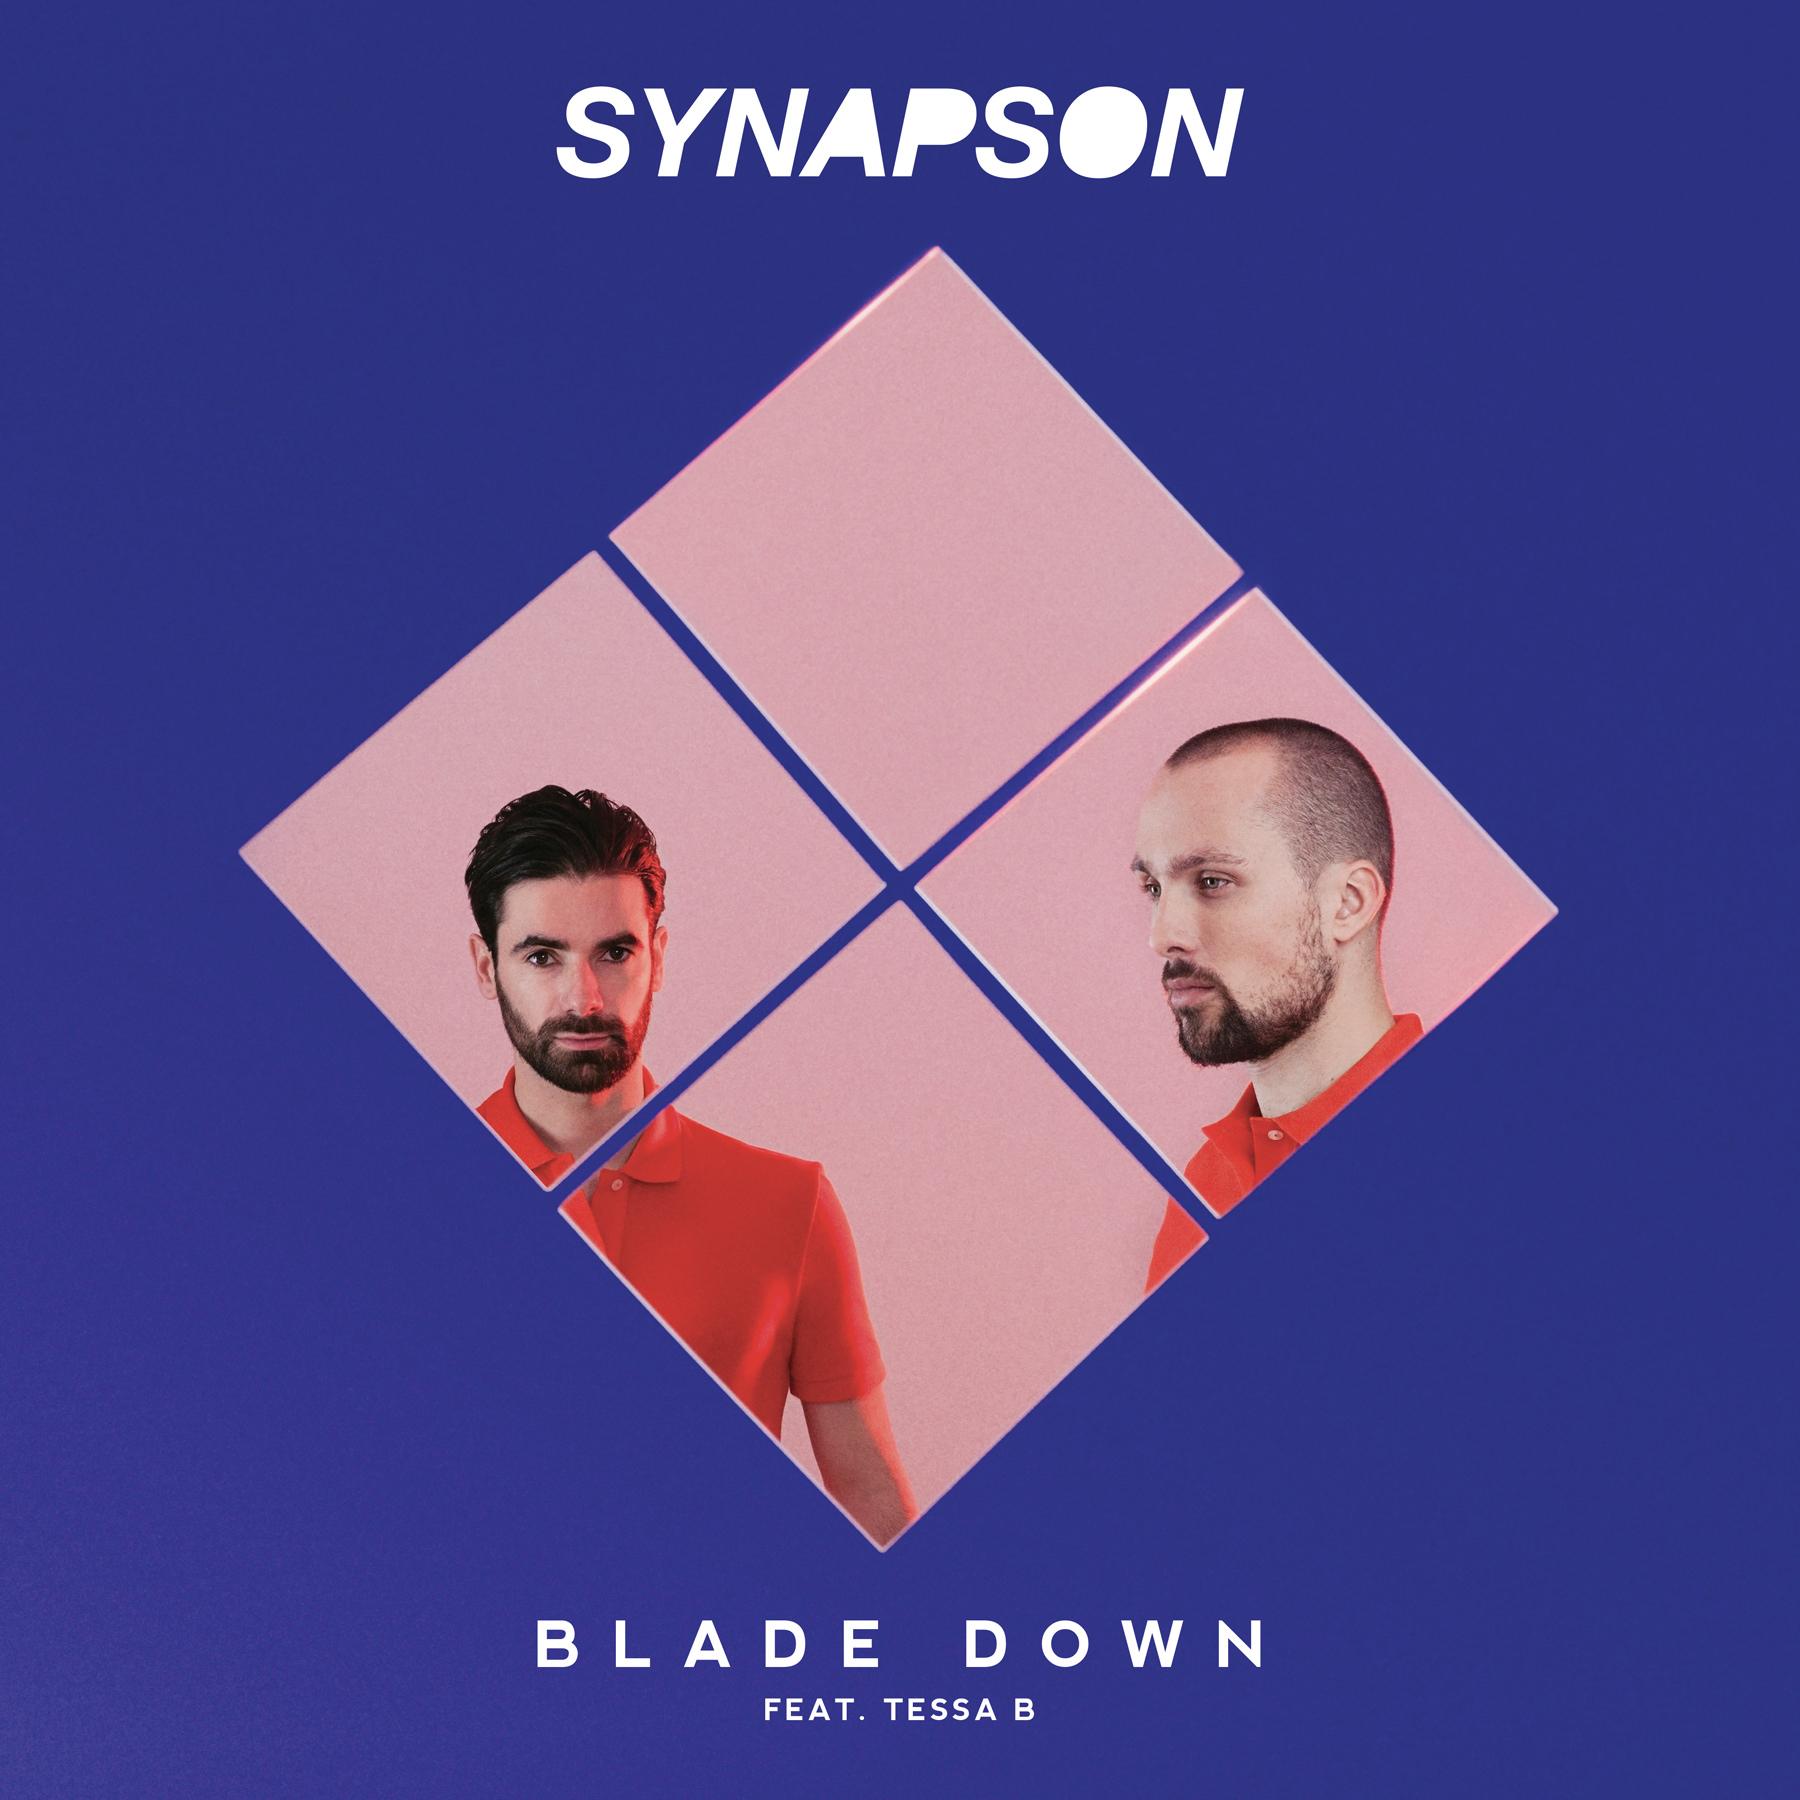 blade-down-synapson-tessa-b-convergence